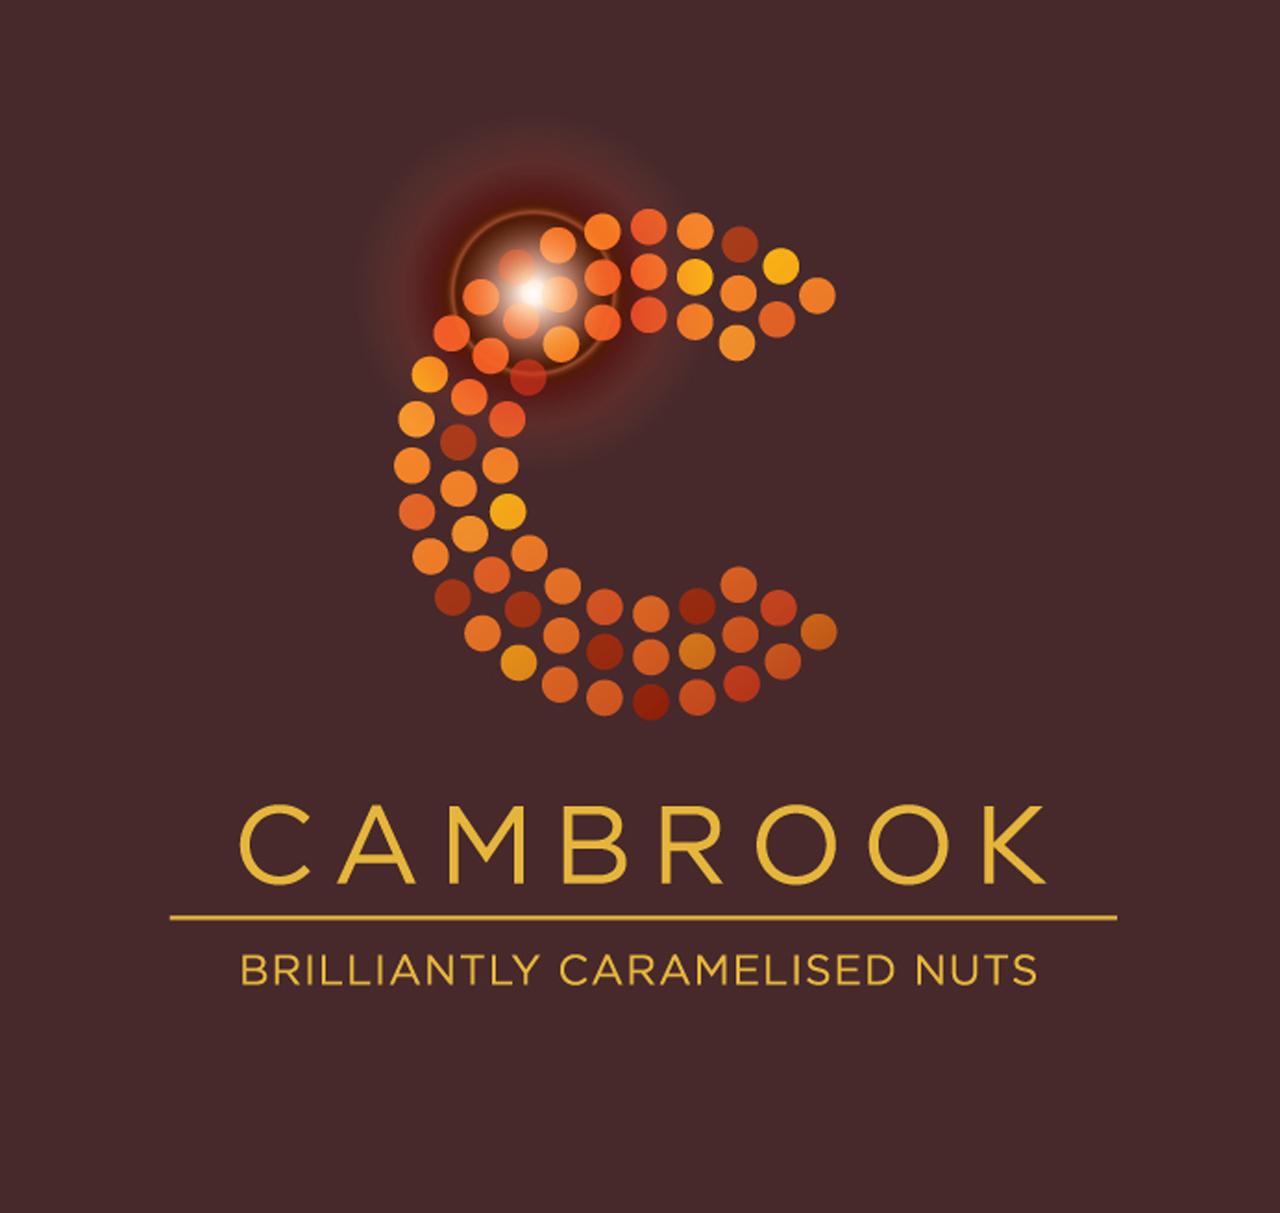 Cambrook